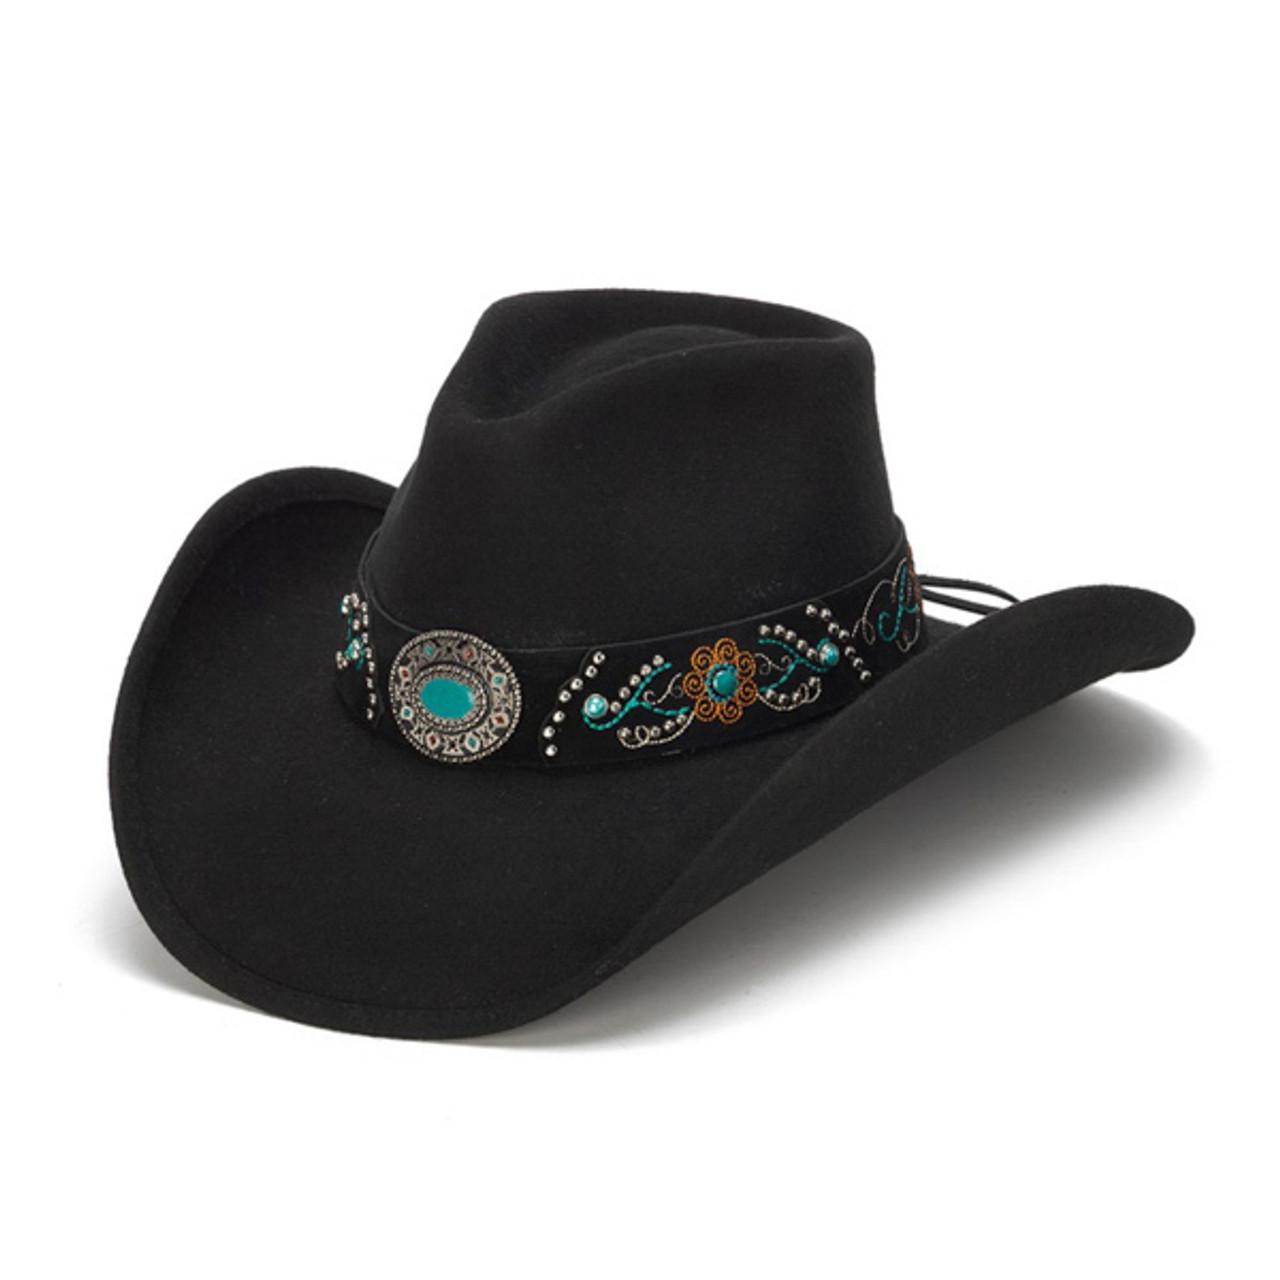 50869c075 Stampede Hats - Turquoise Blue Stone Felt Cowboy Hat